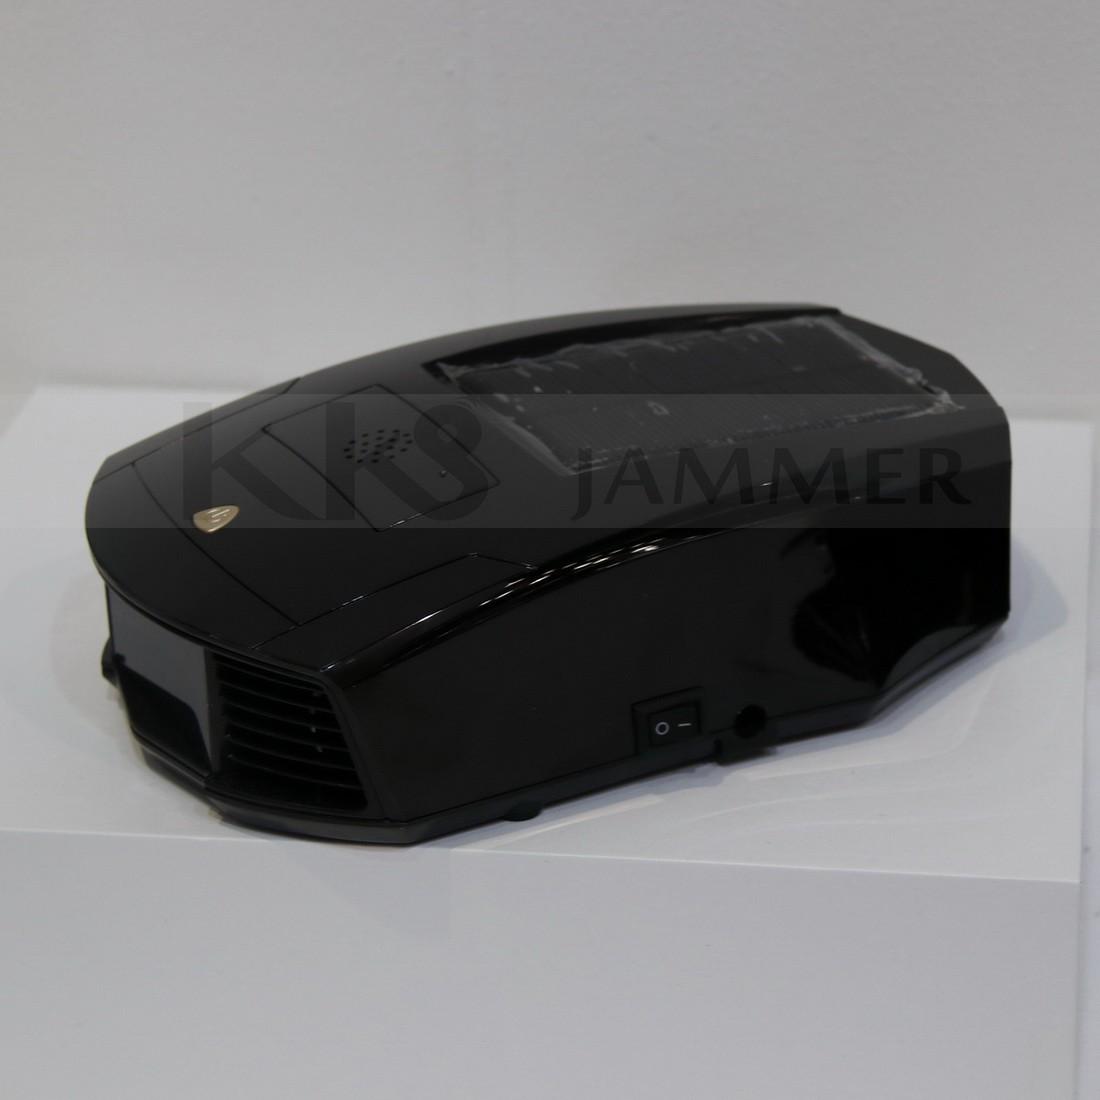 Audio recorder blocker - mobile blocker Yonkers